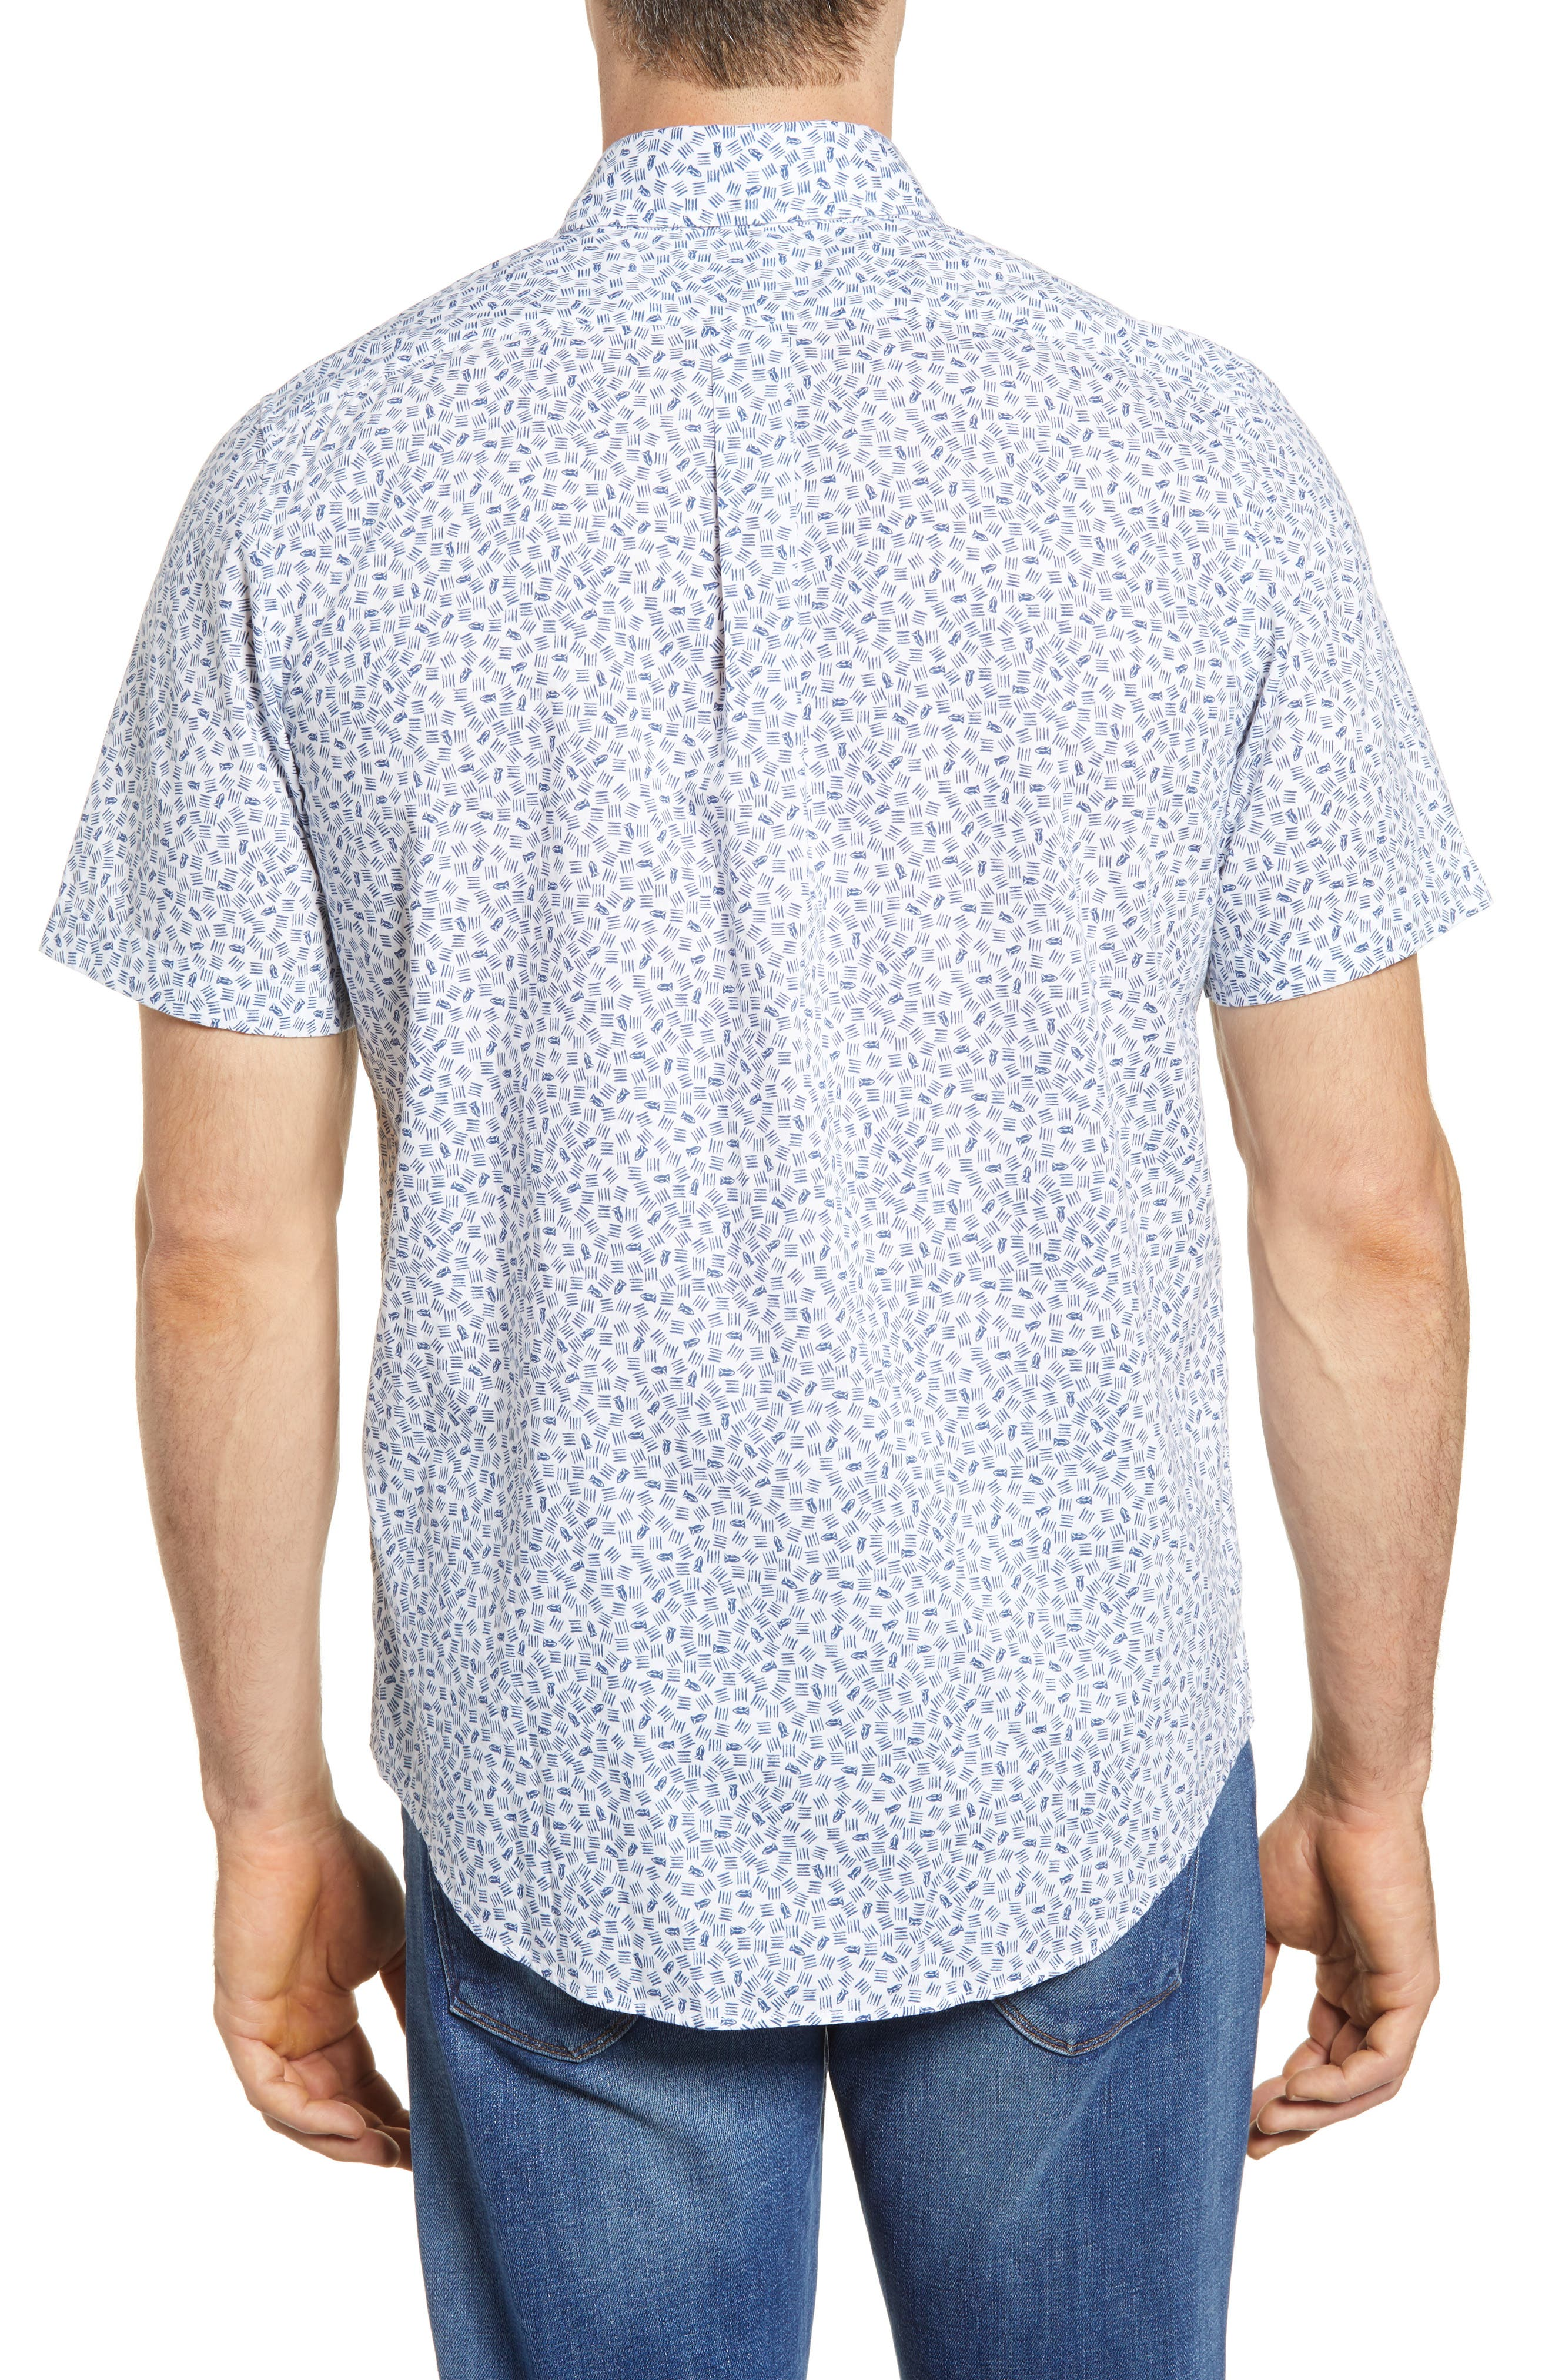 VINEYARD VINES,                             Fish Dash Tucker Slim Fit Sport Shirt,                             Alternate thumbnail 2, color,                             100